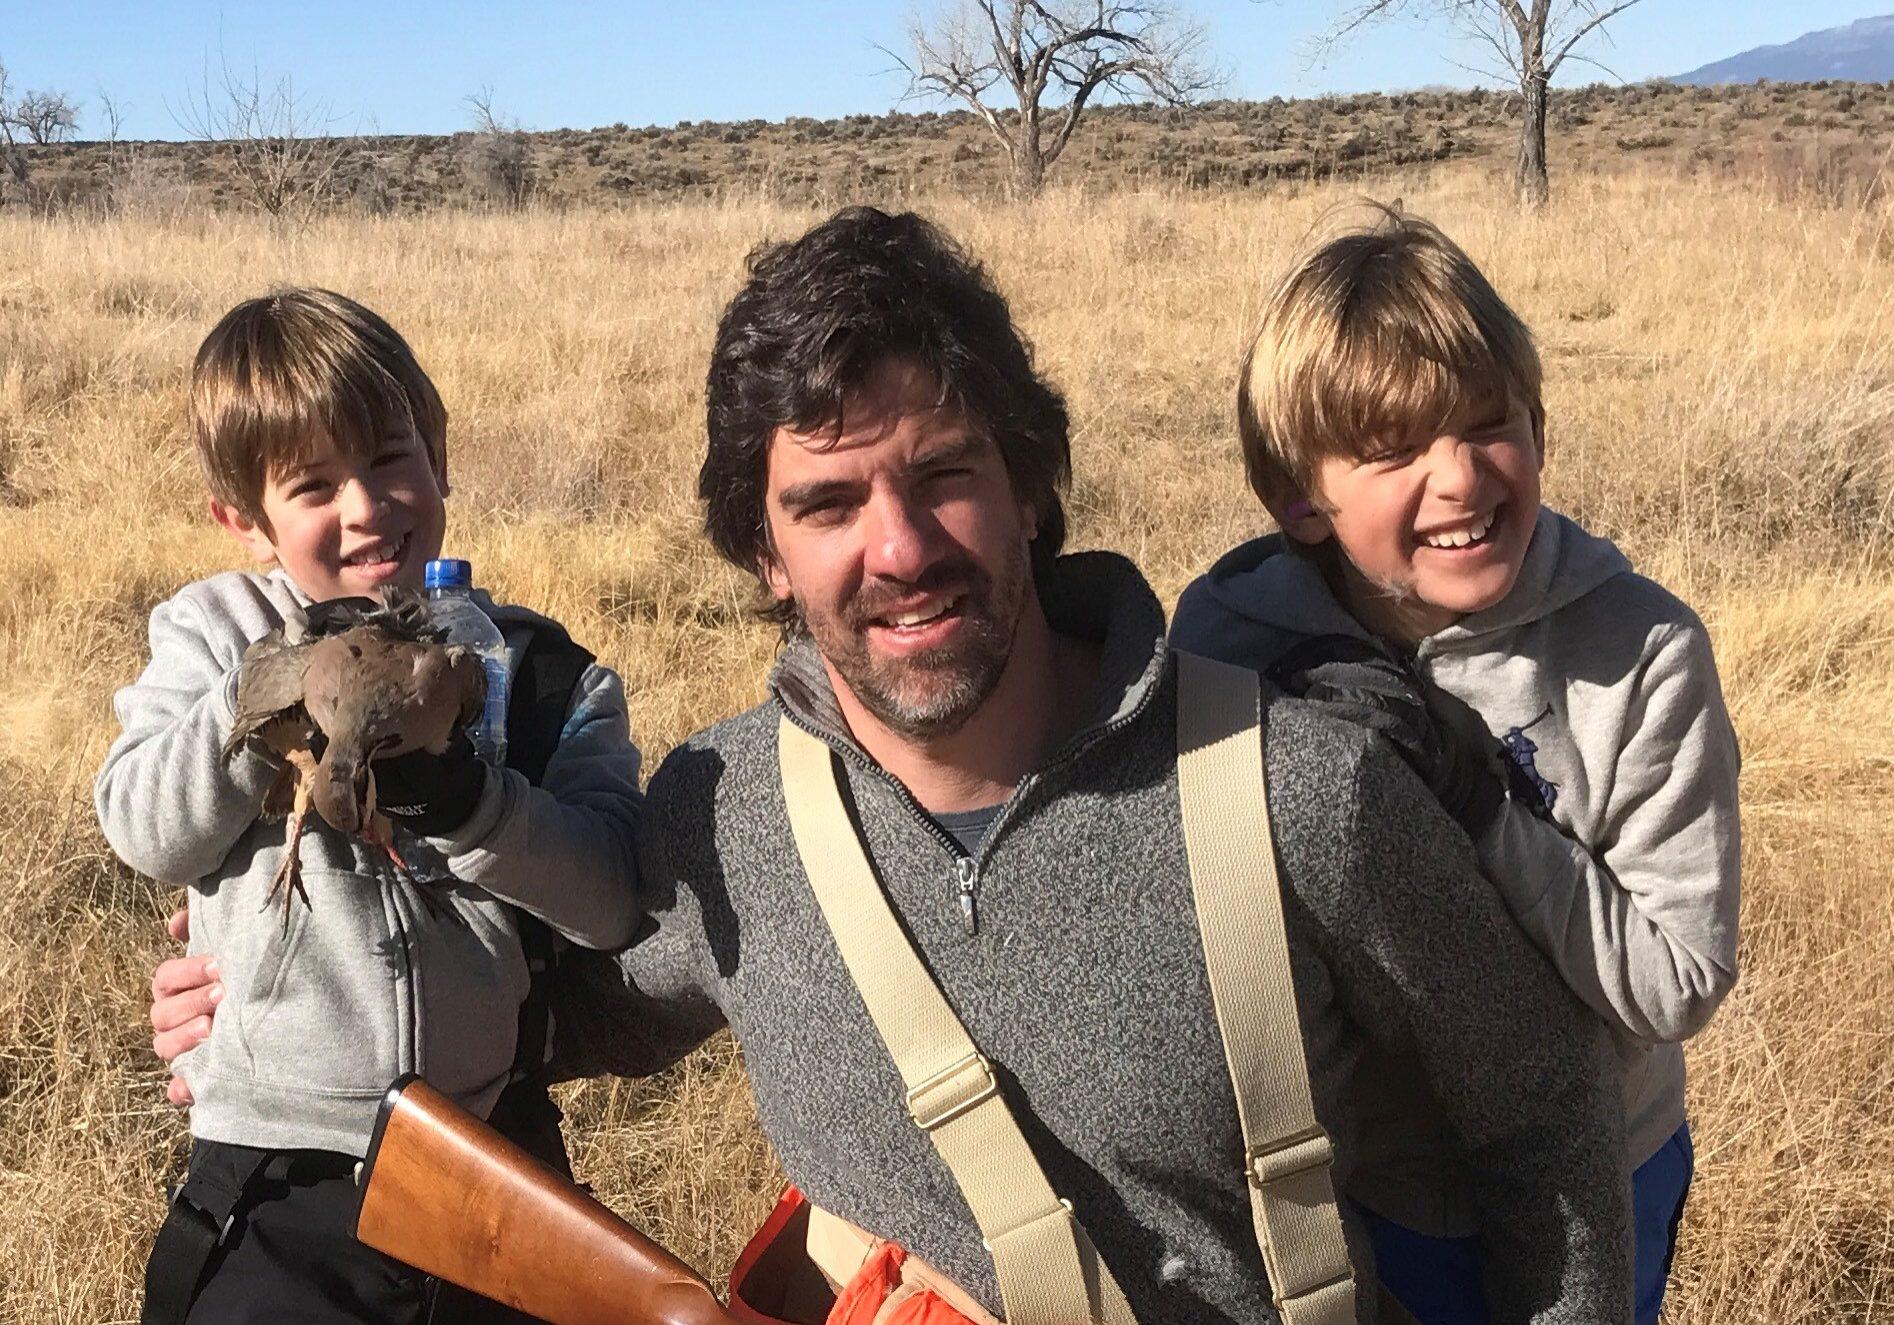 hot guy with boys hunting birds